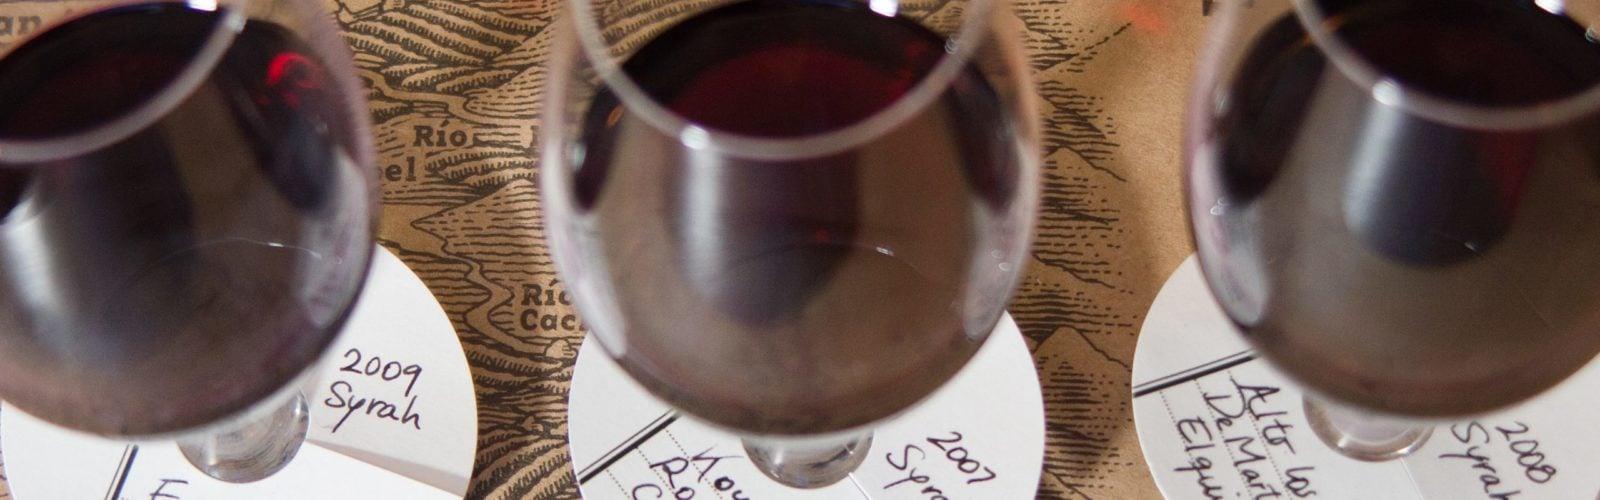 bocanariz-wine-tasting